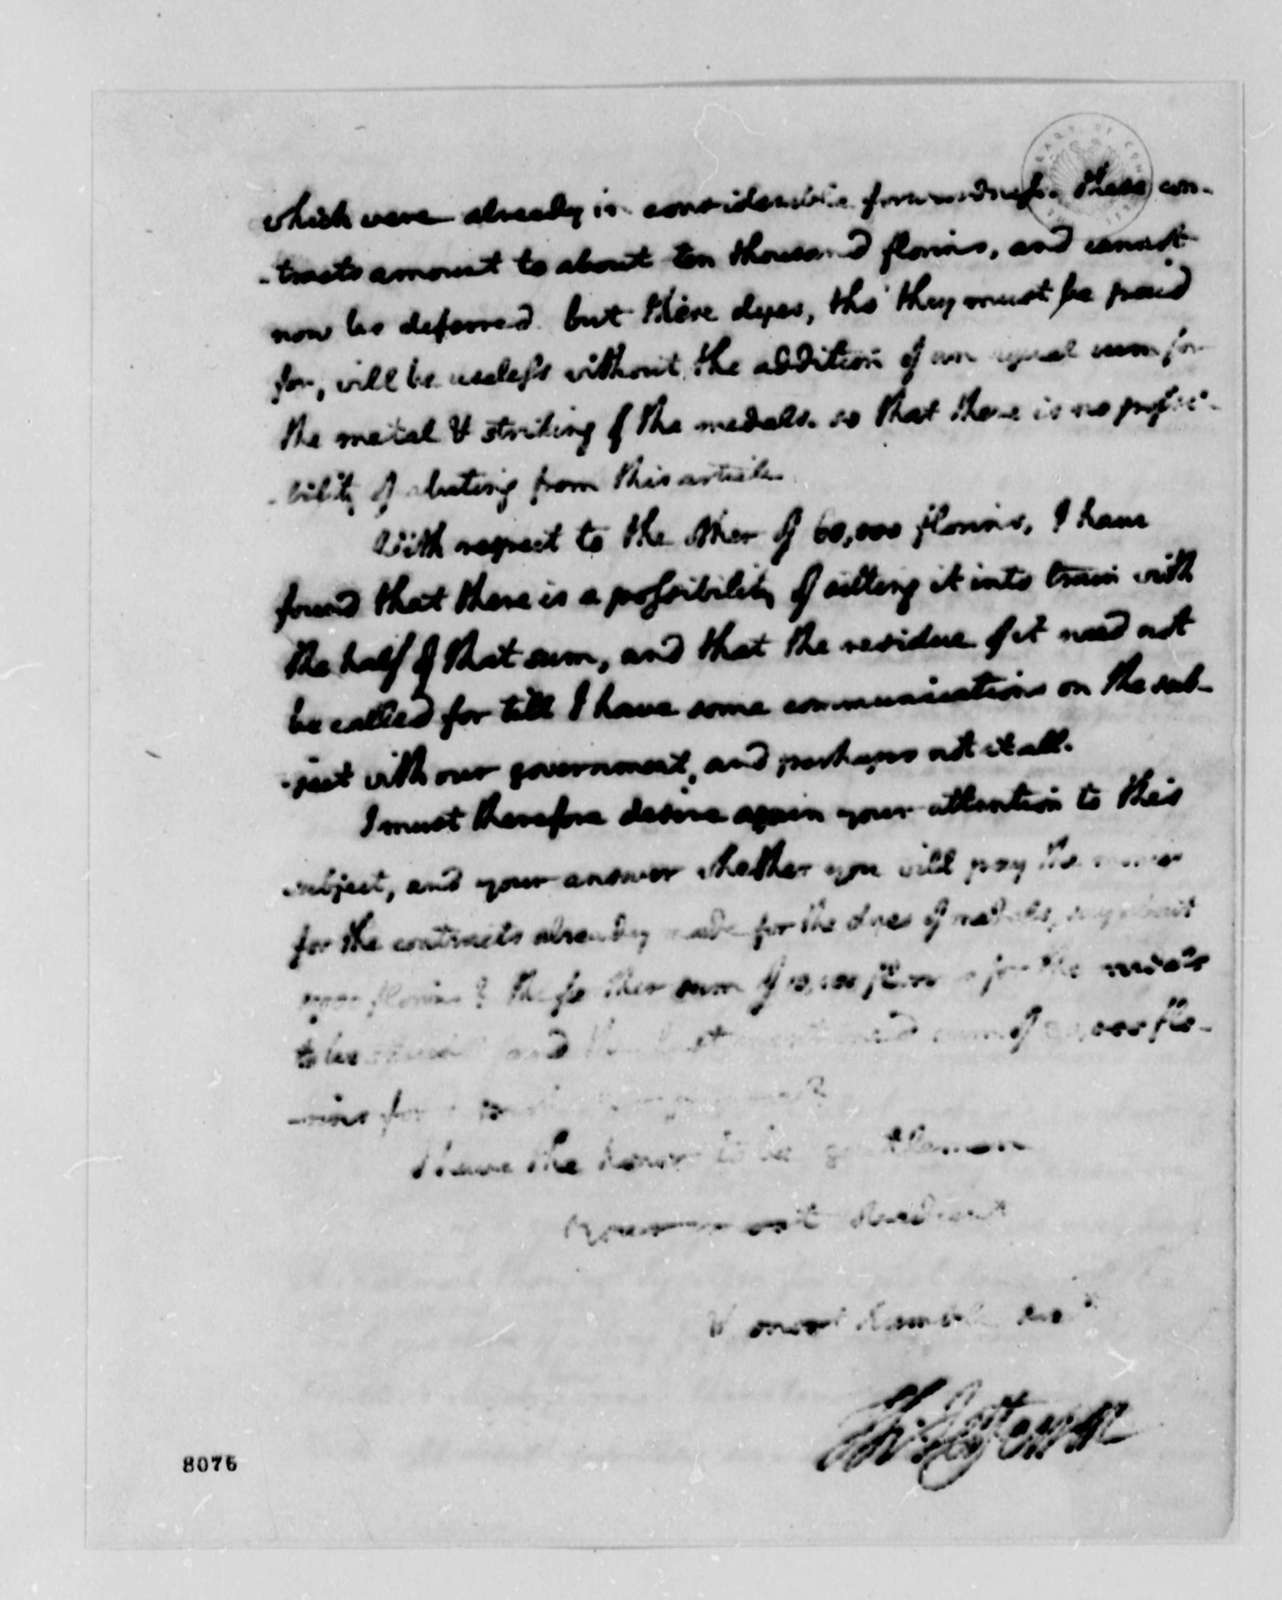 Thomas Jefferson to Wilhelm Willink, et al, March 11, 1789